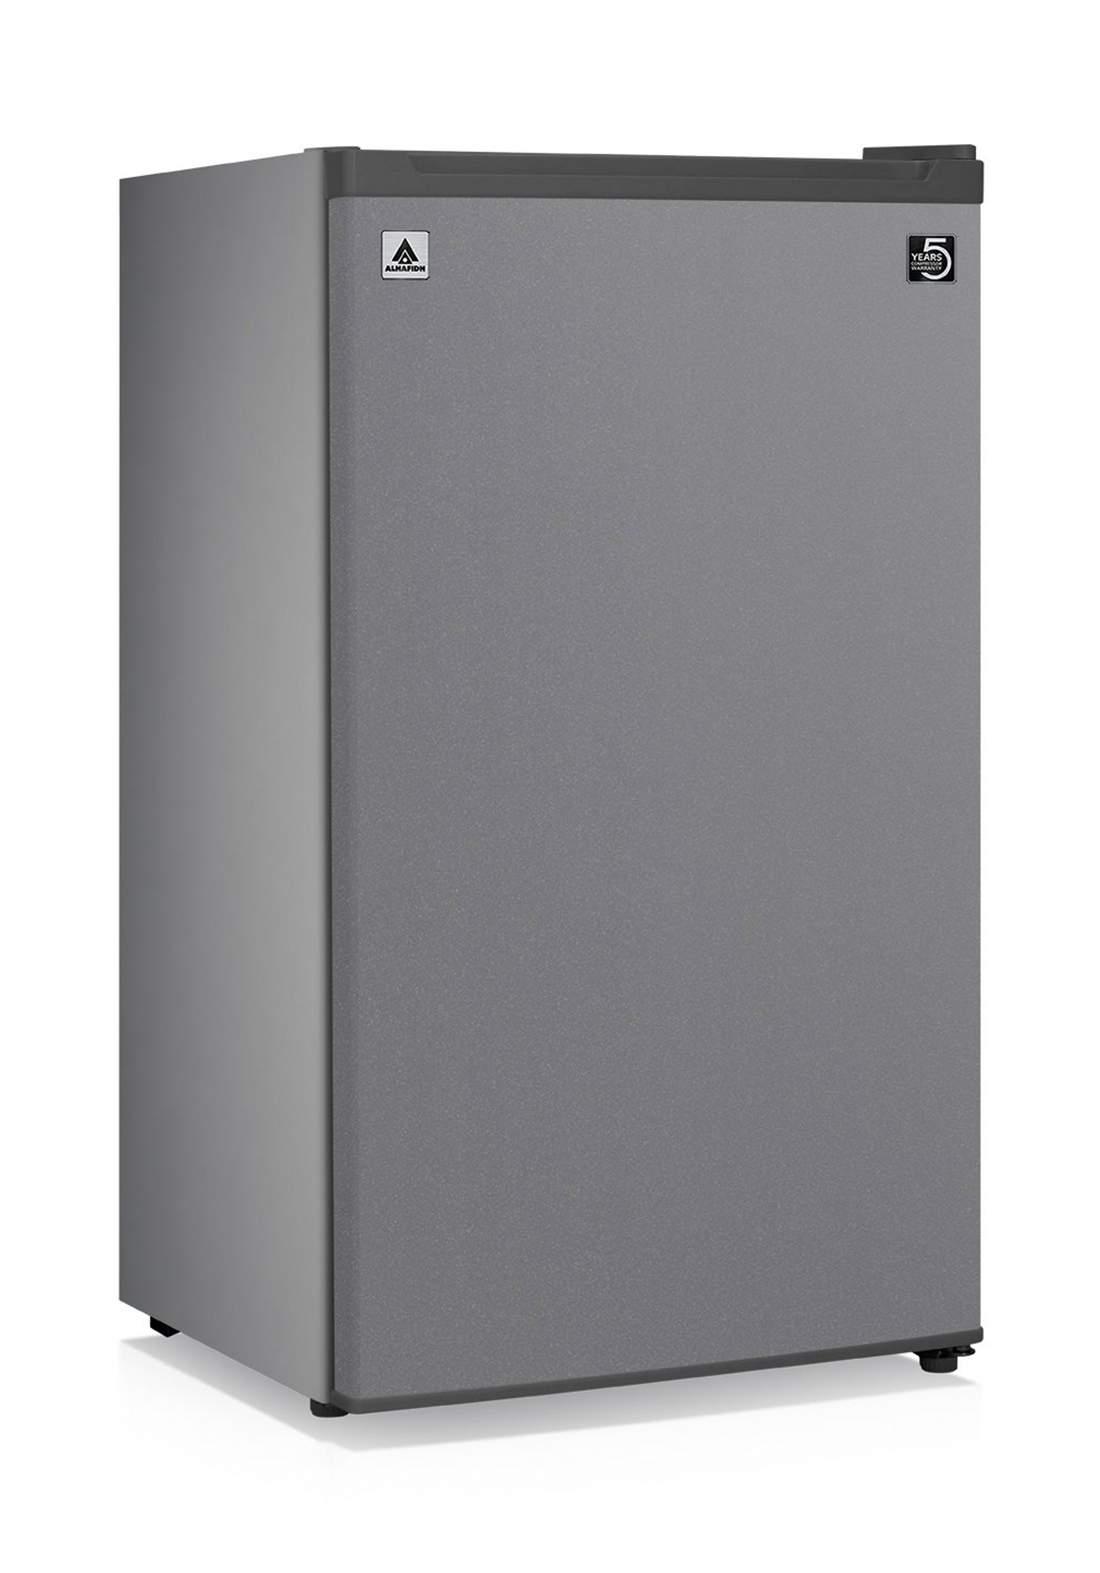 Alhafidh RFHA-SD136DS1 Minibar Refrigerator 4 ft ثلاجة